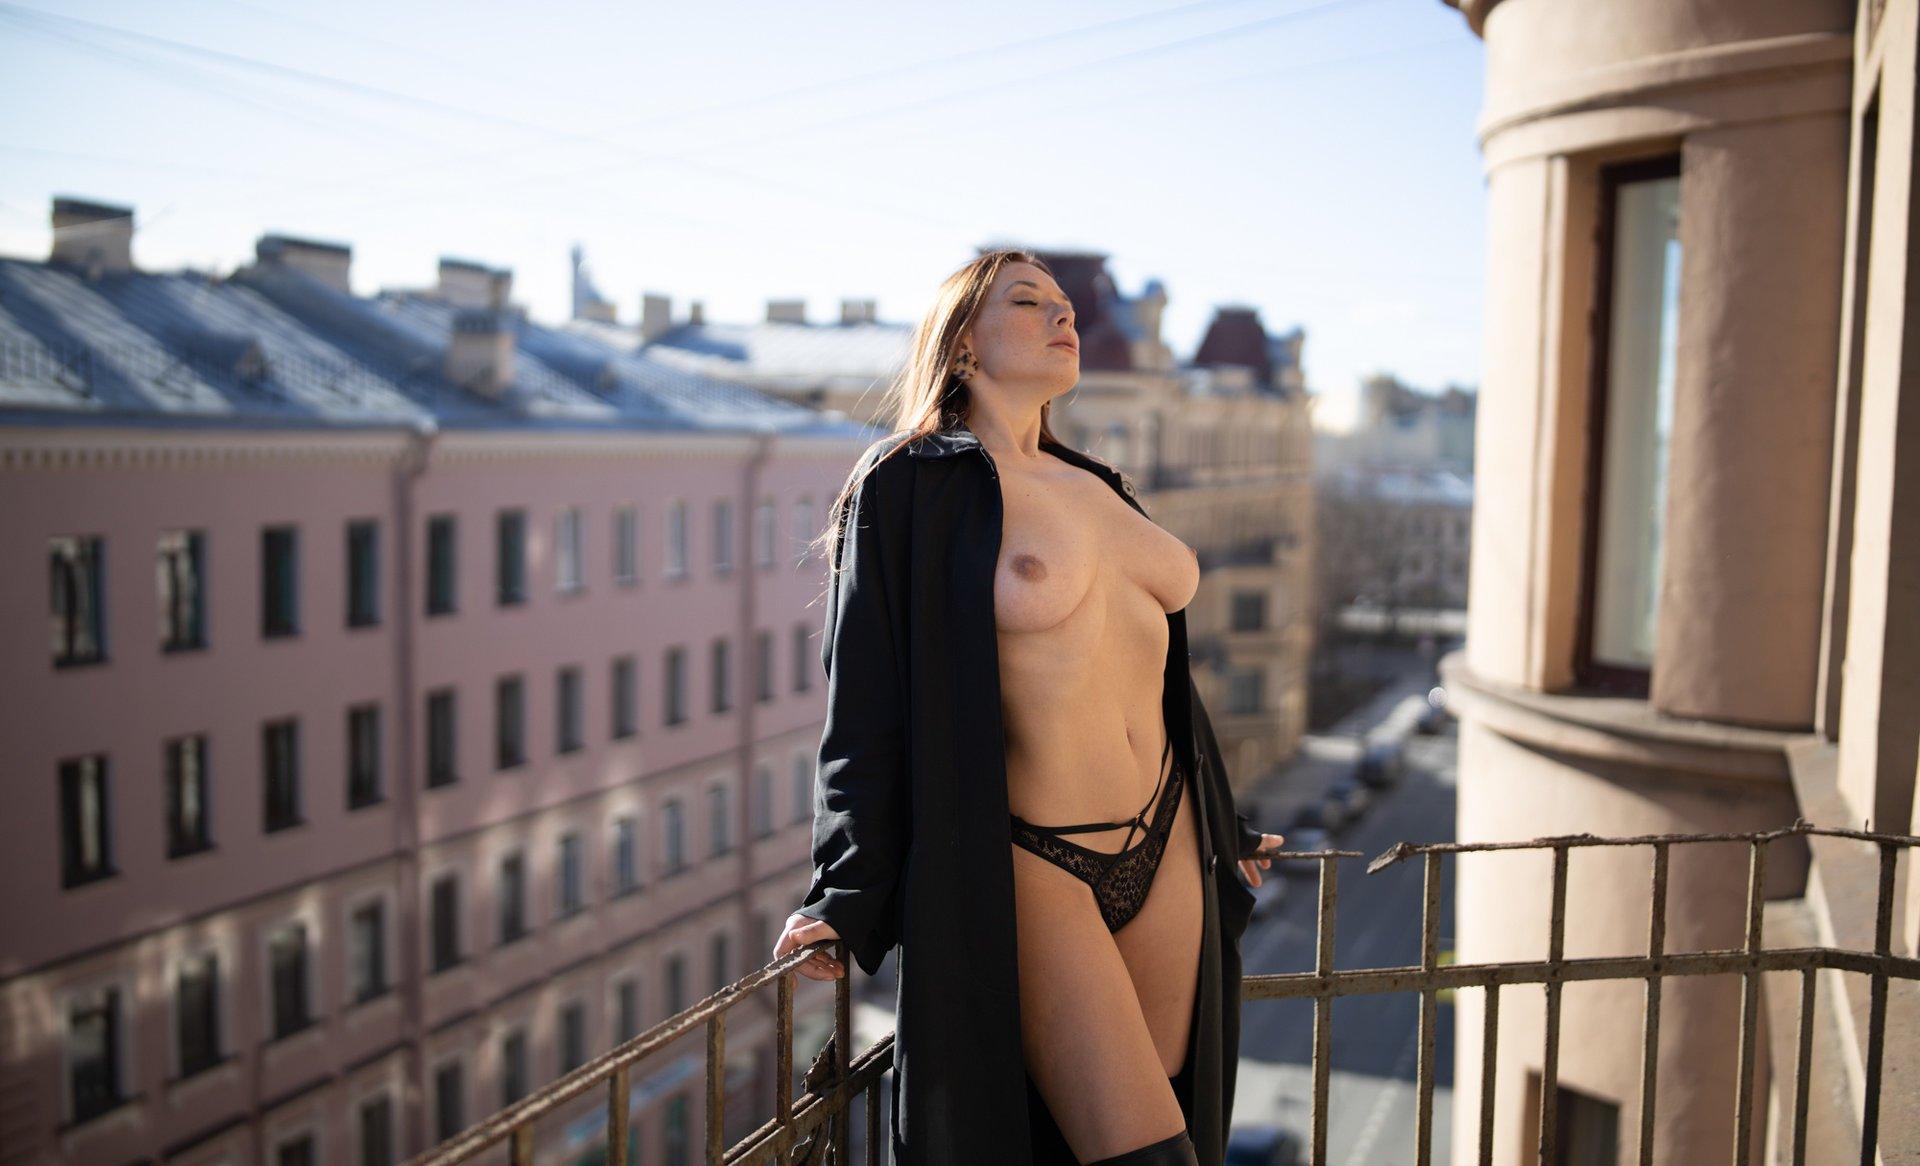 Olga Kobzar Bugs Bunny Gf Nudes Leaks 0018